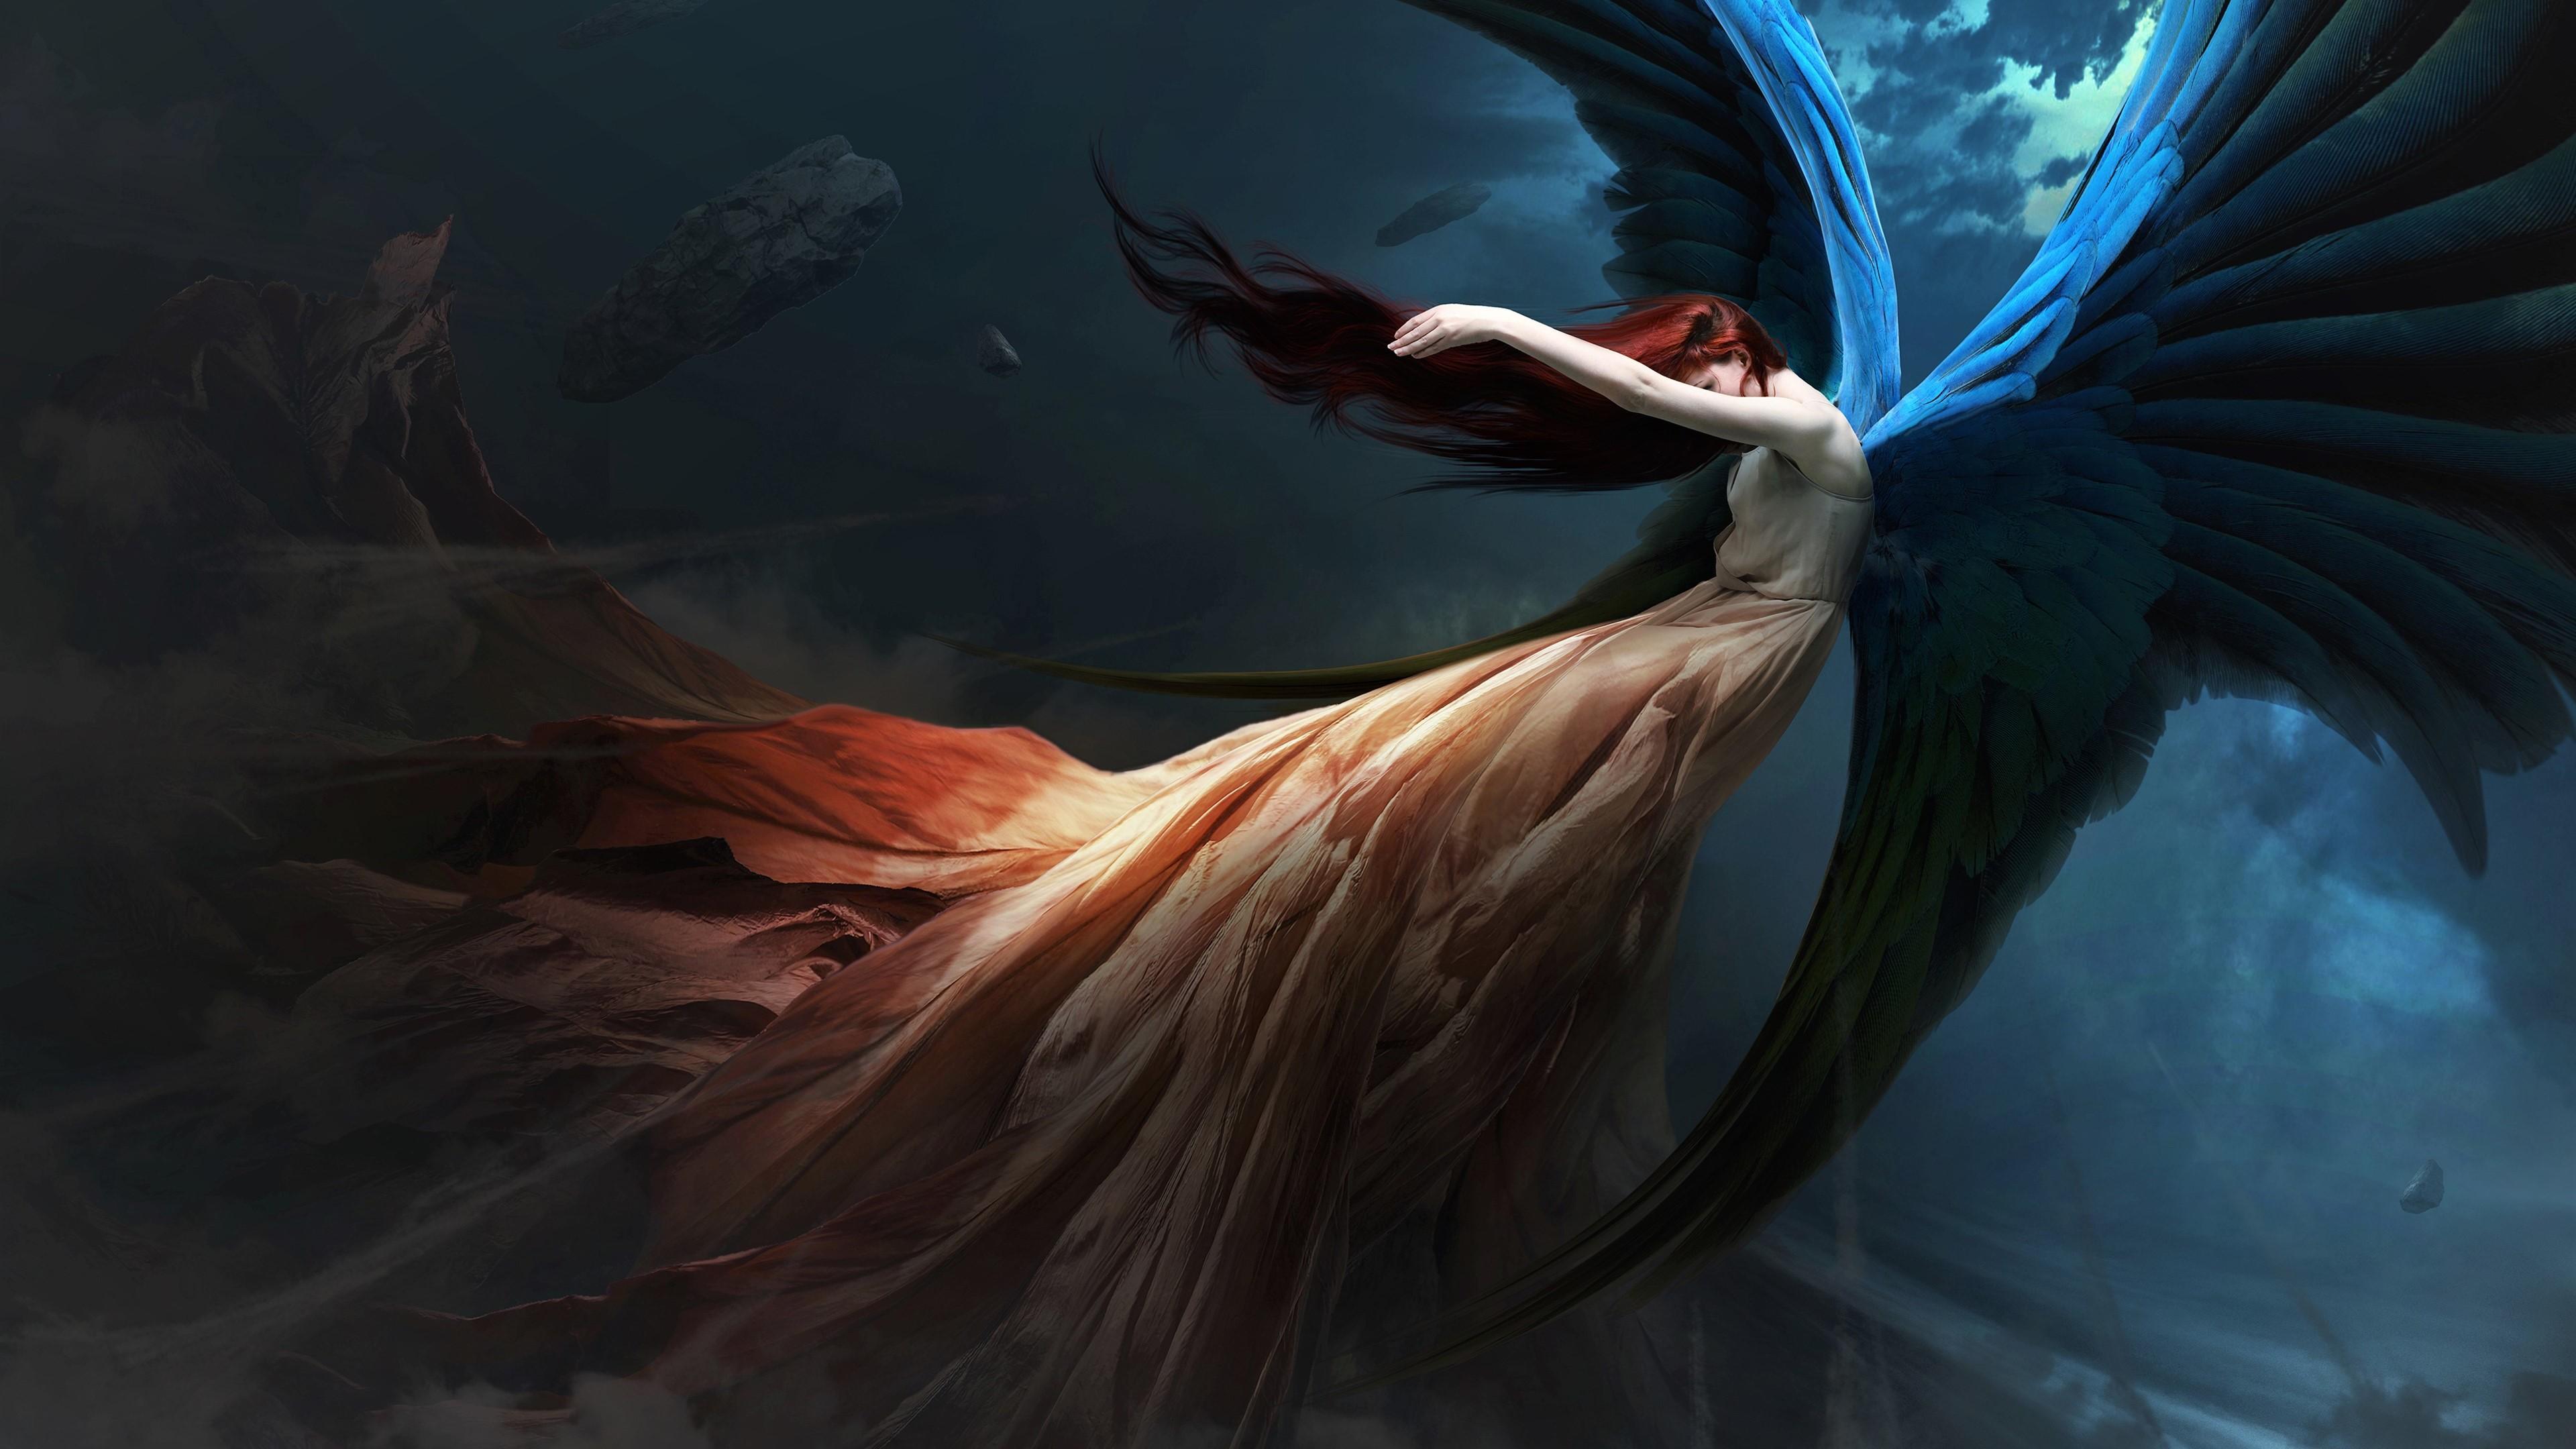 Wallpaper 4k Fantasy Angel Redhead Wings 4k 4k Wallpapers